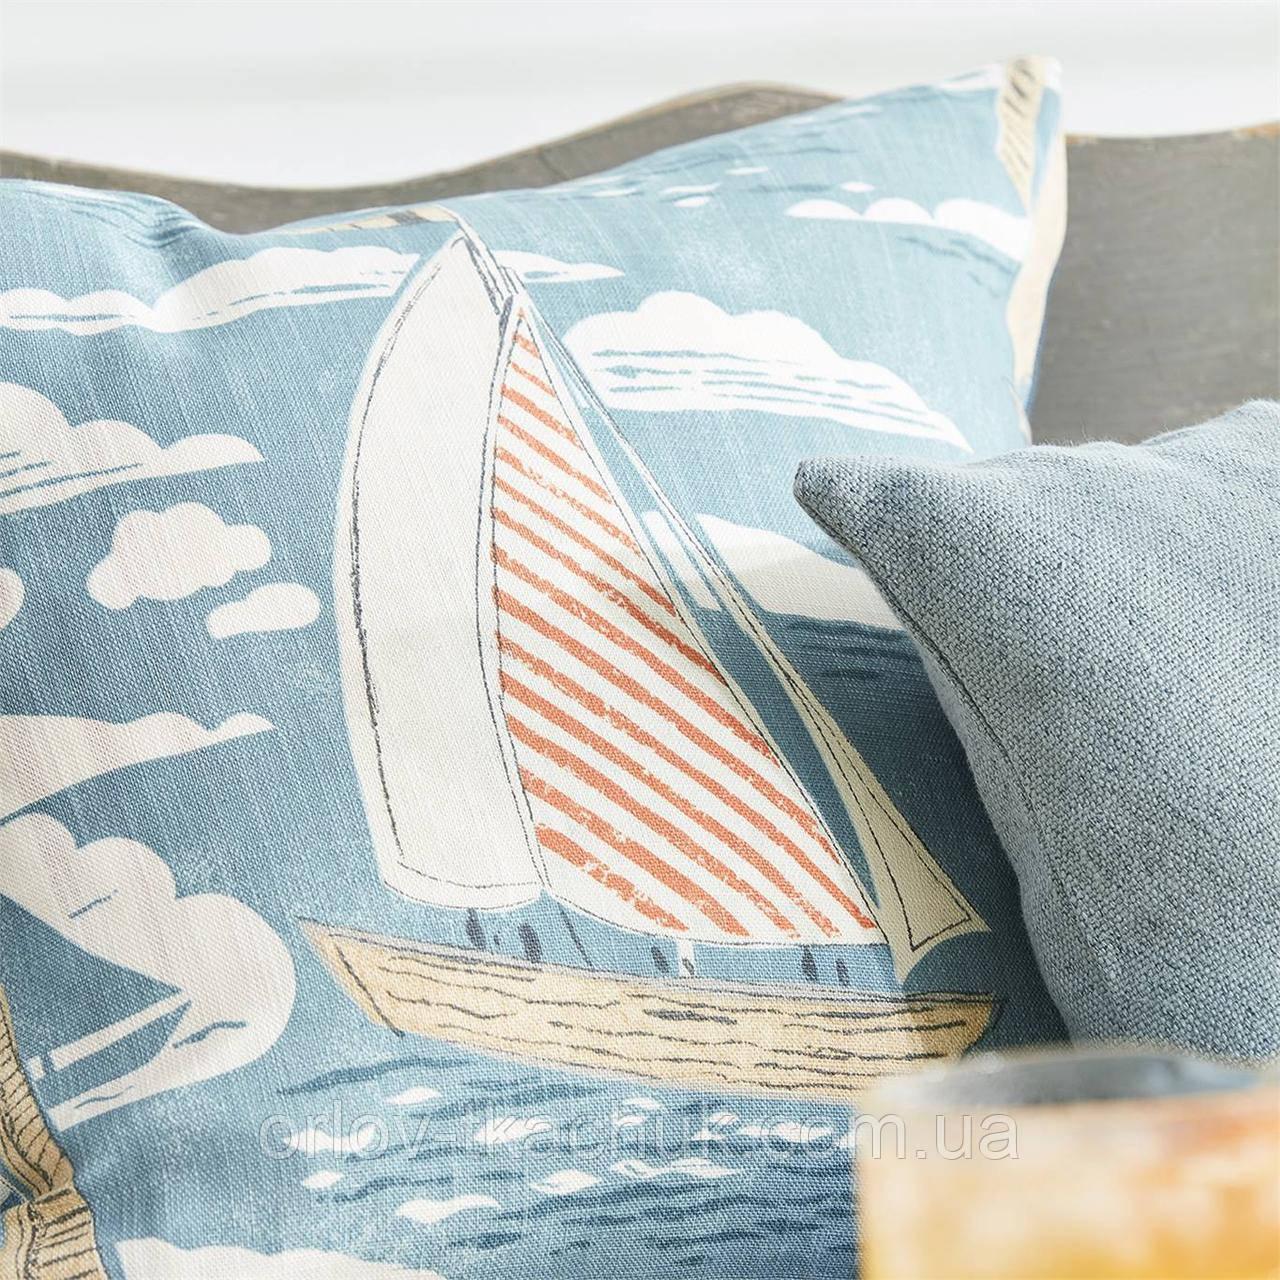 Ткань интерьерная Sailor Port Isaac Sanderson